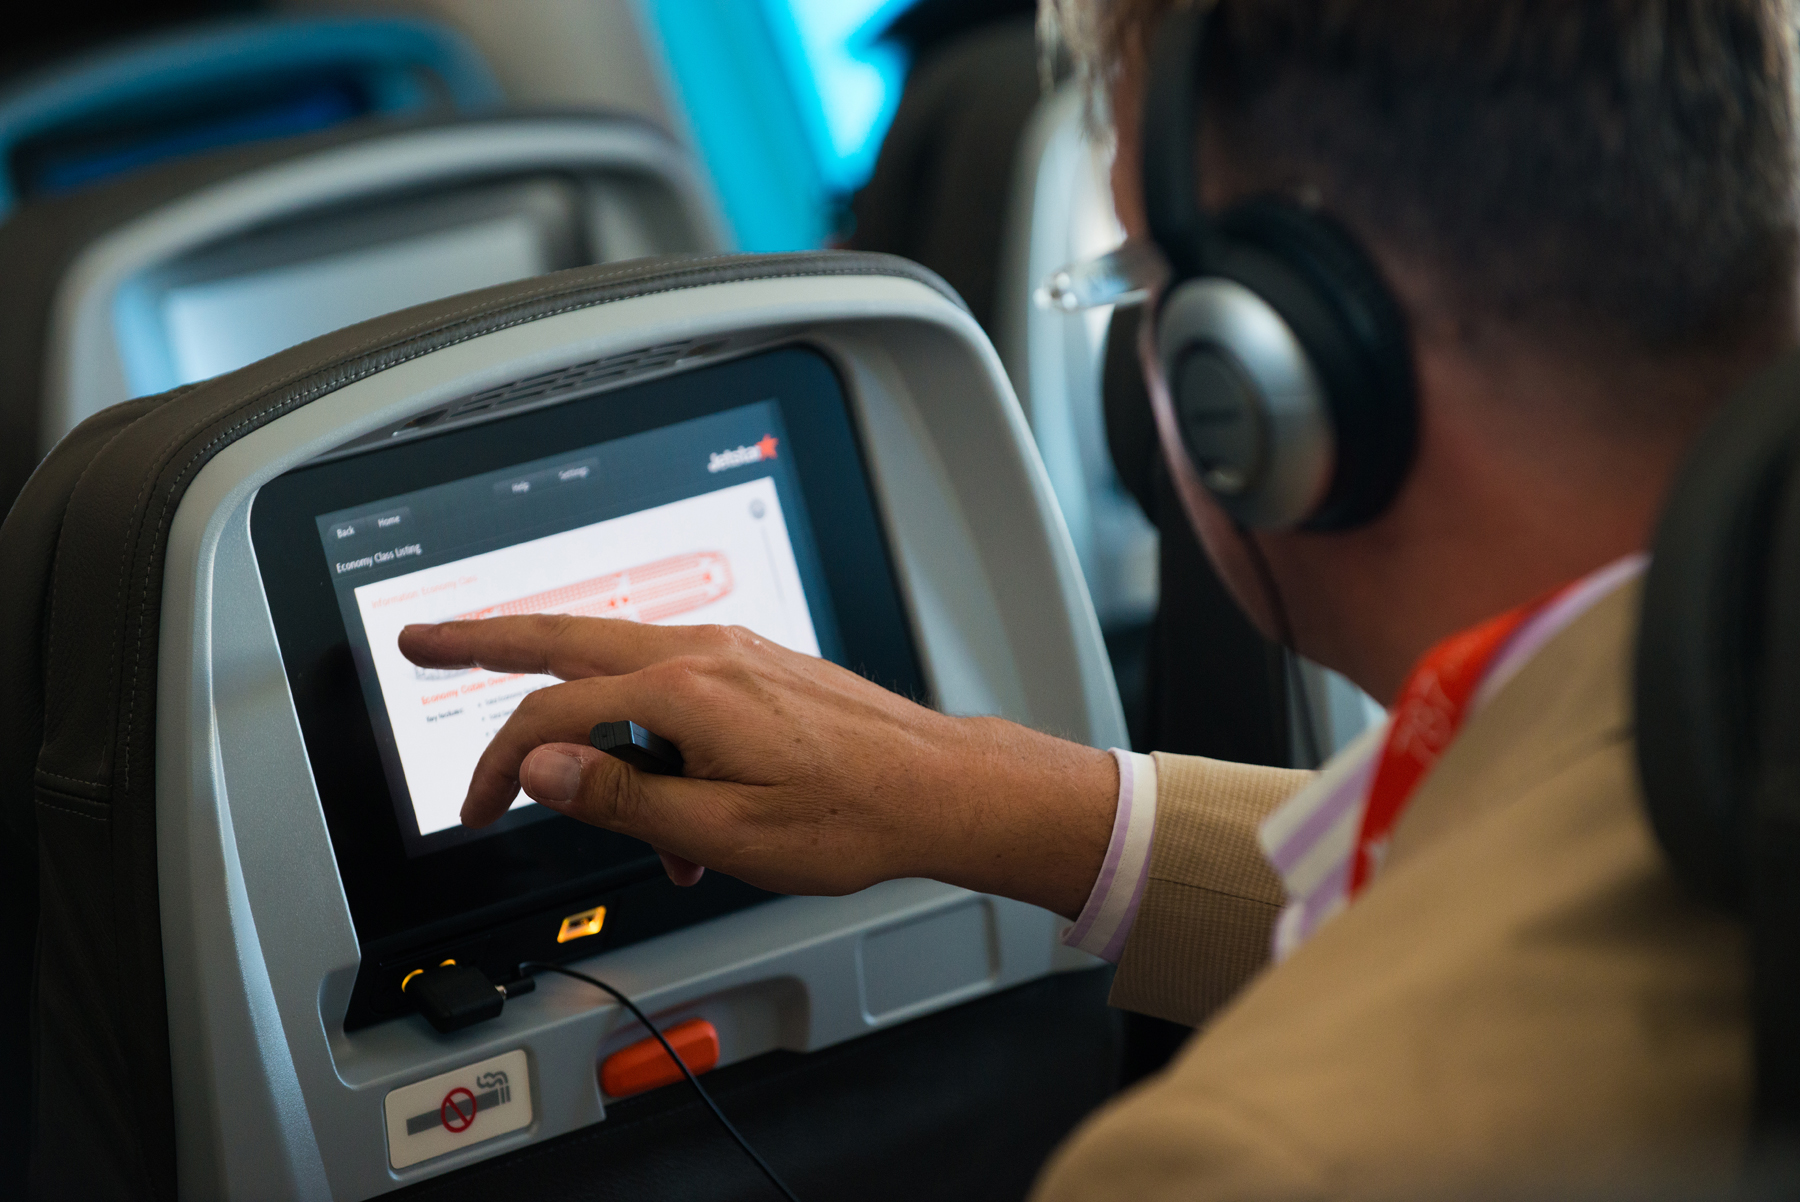 Enjoying_the_in-flight_entertainment_system_(10832720896)